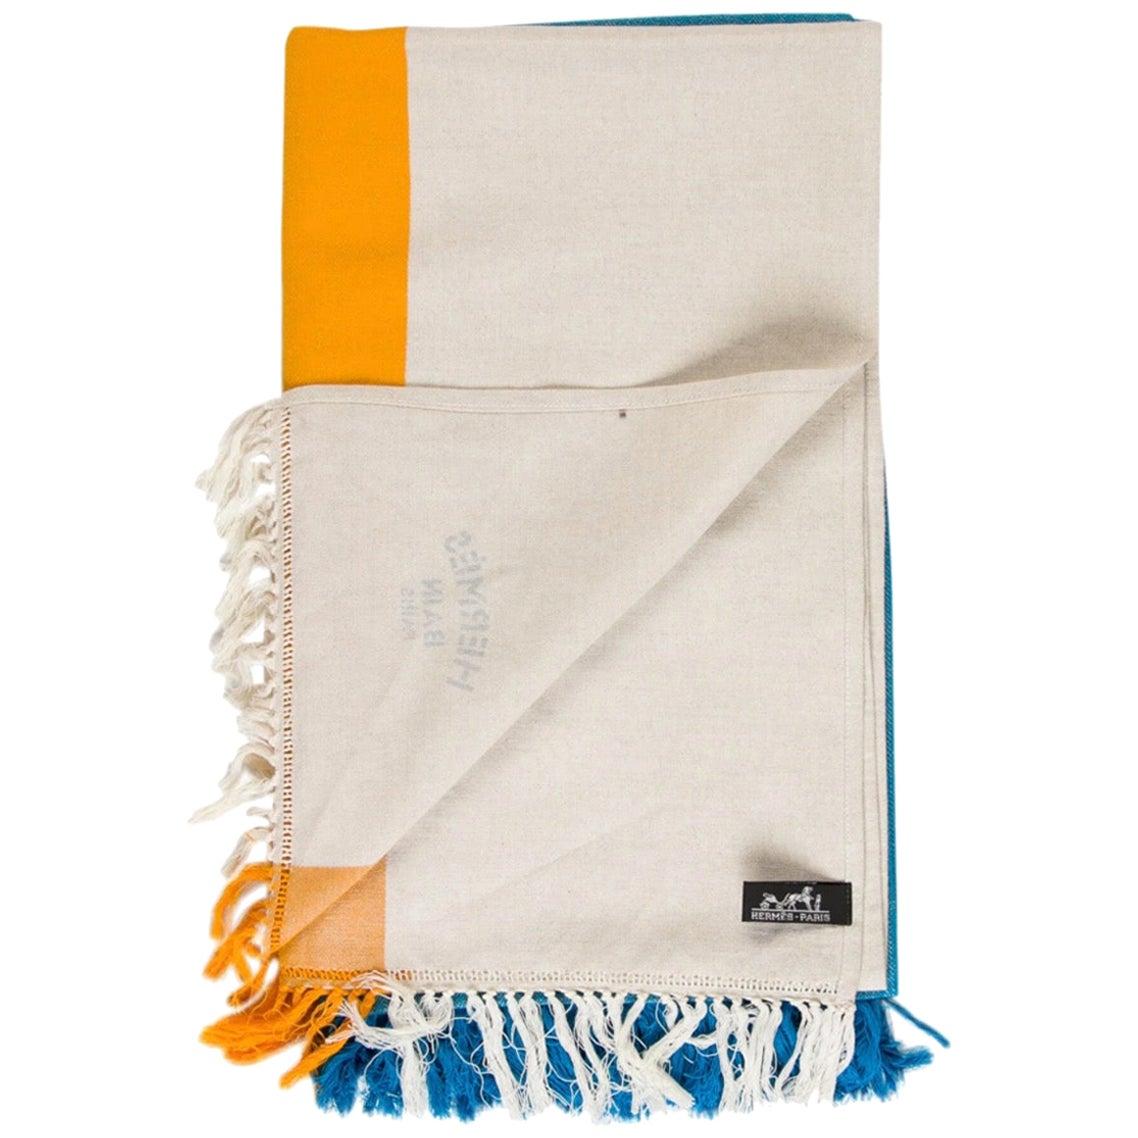 Hermes NEW Blue Yellow Ivory Stripe Beach Fringe Blanket Throw in Box